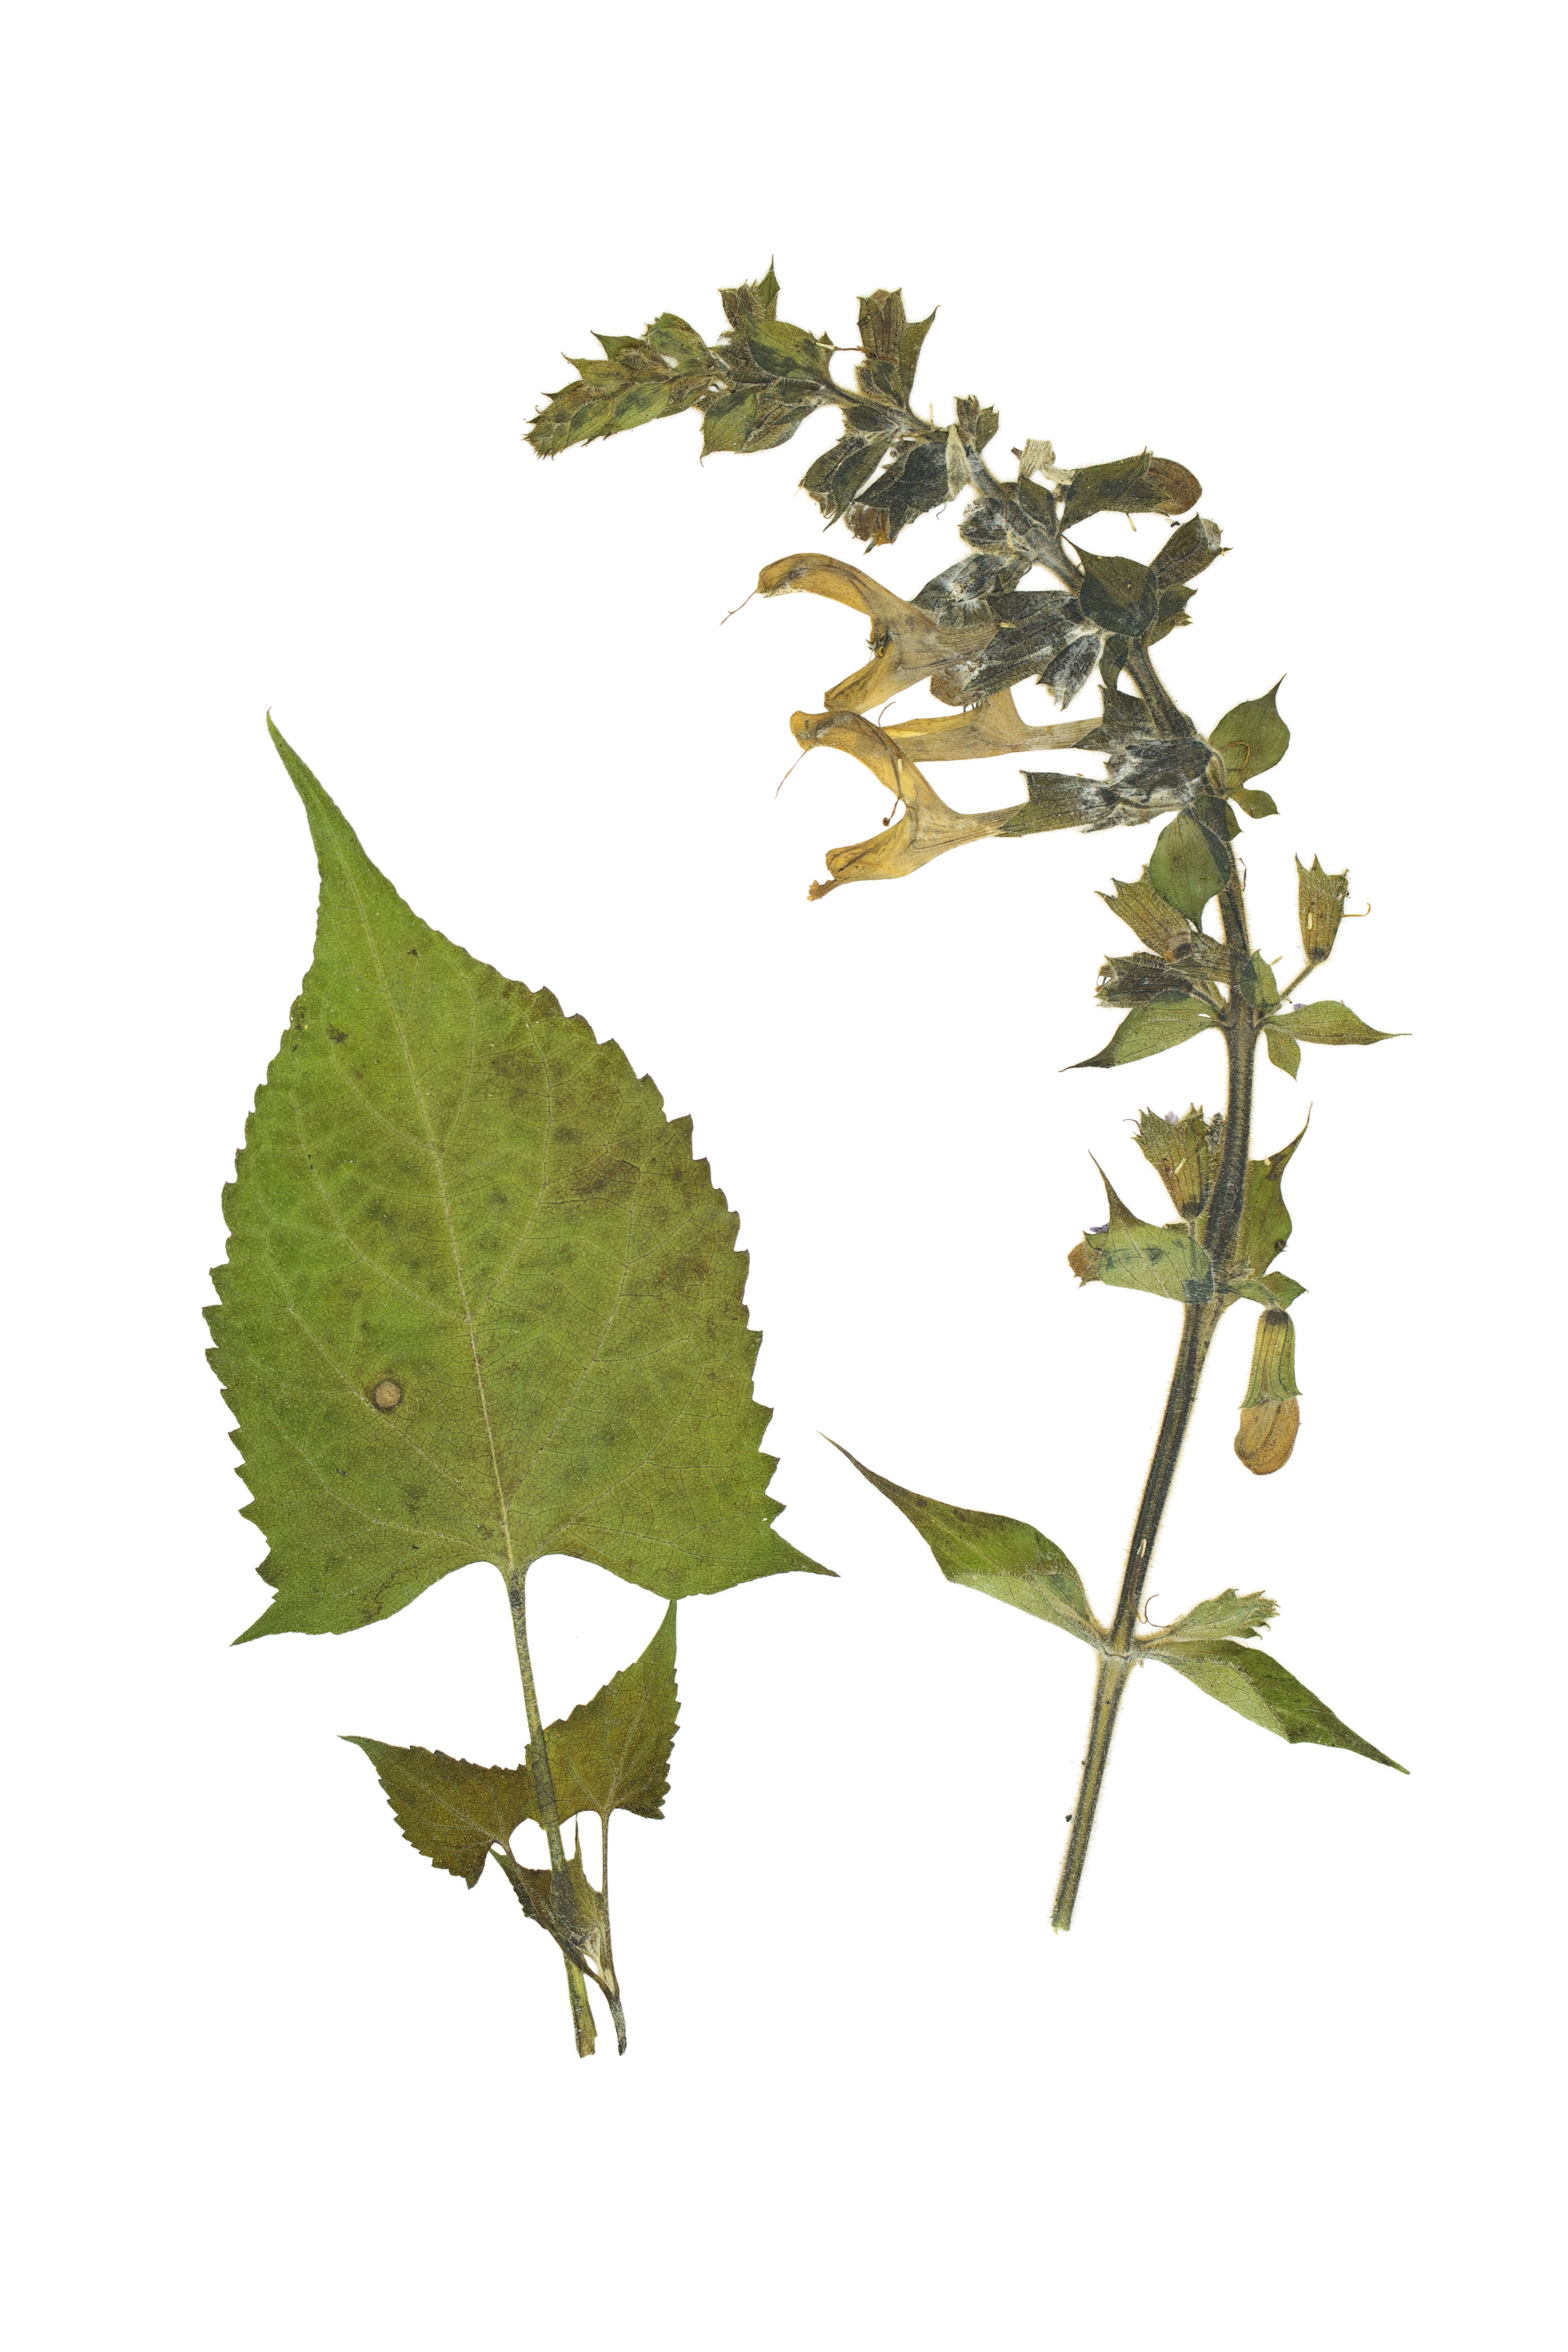 New! Sticky Sage / Salvia glutinosa